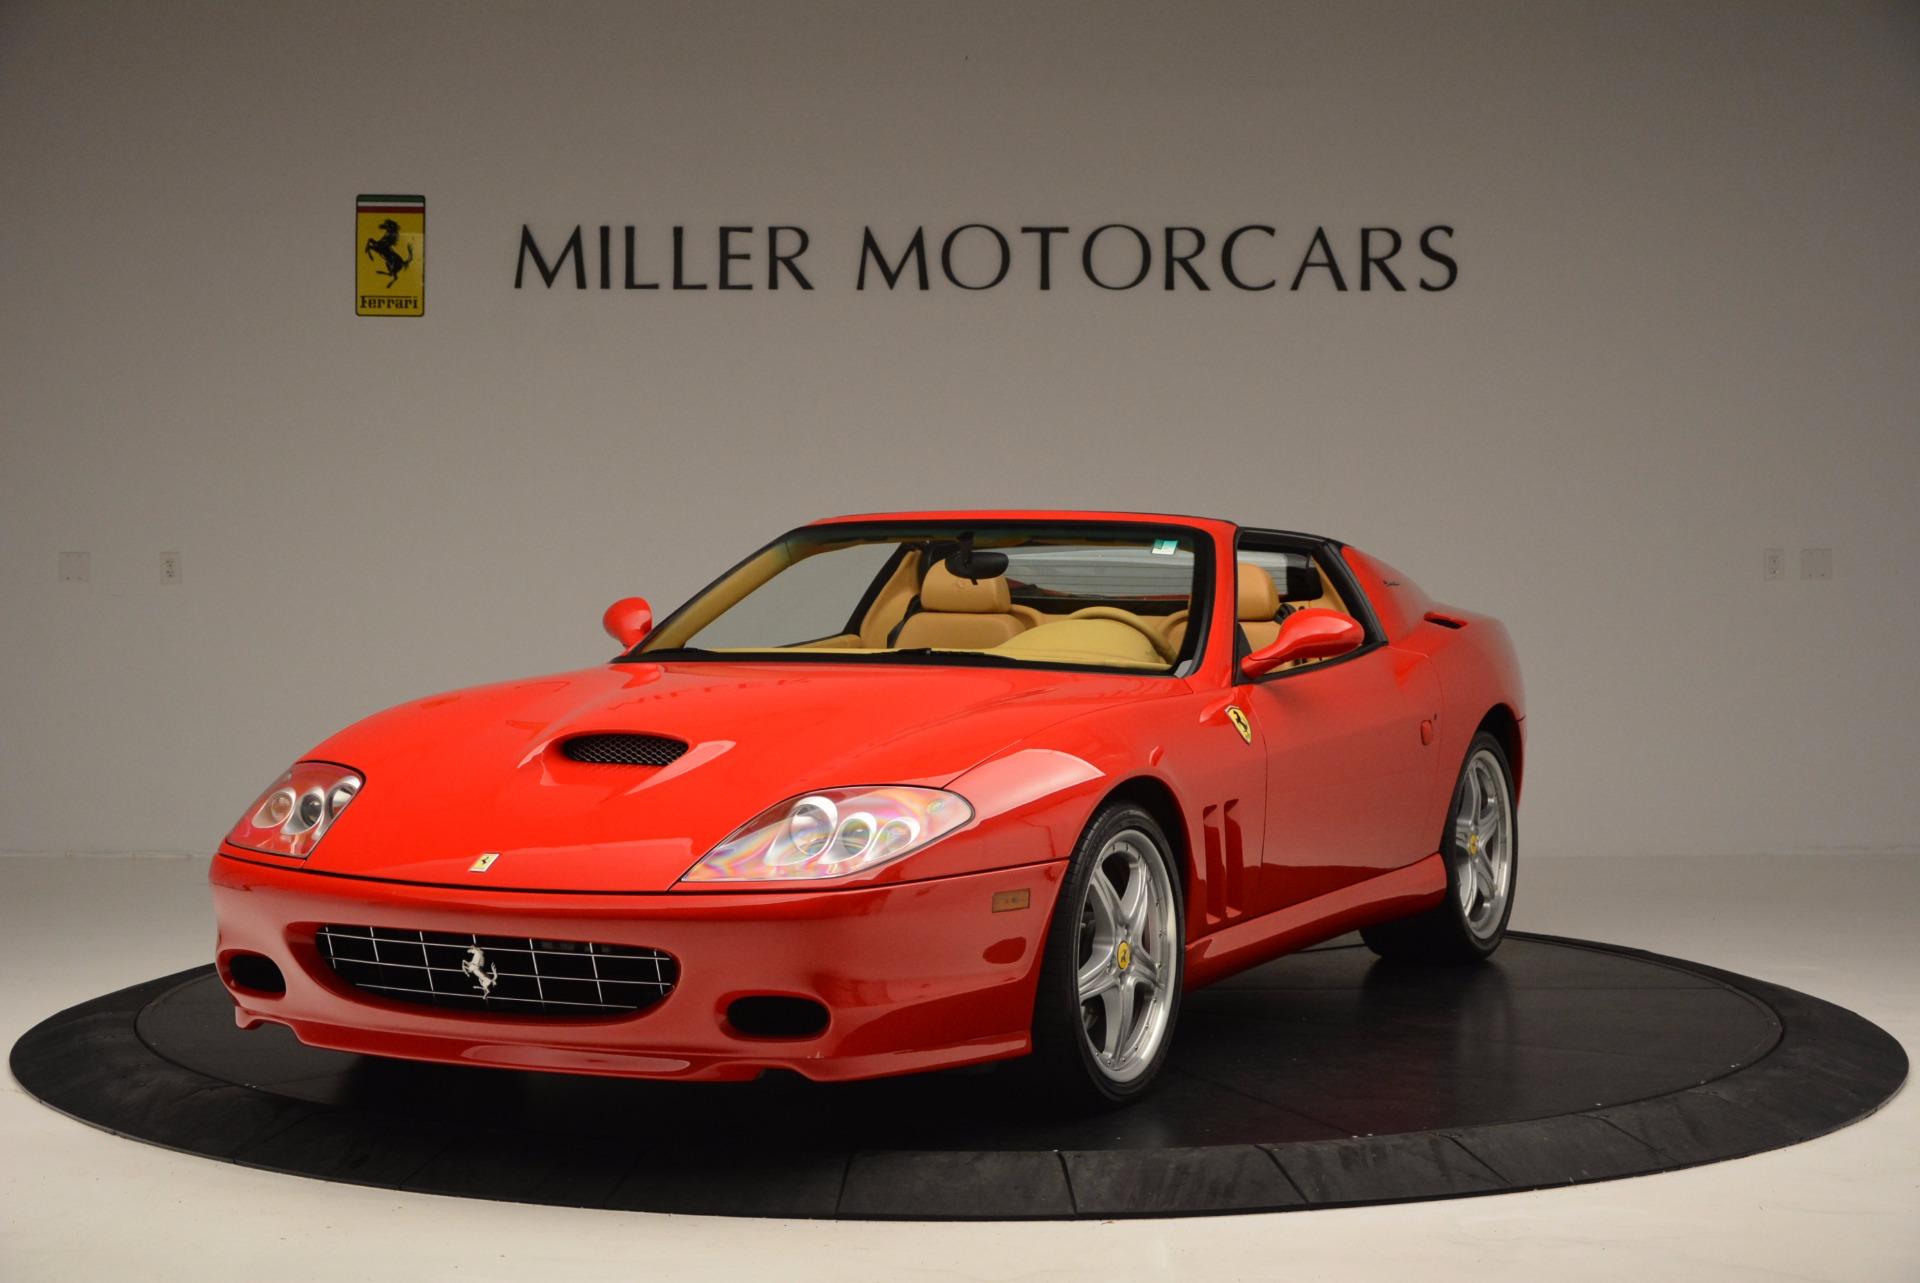 Used 2005 Ferrari Superamerica 6-Speed Manual for sale Sold at Alfa Romeo of Greenwich in Greenwich CT 06830 1